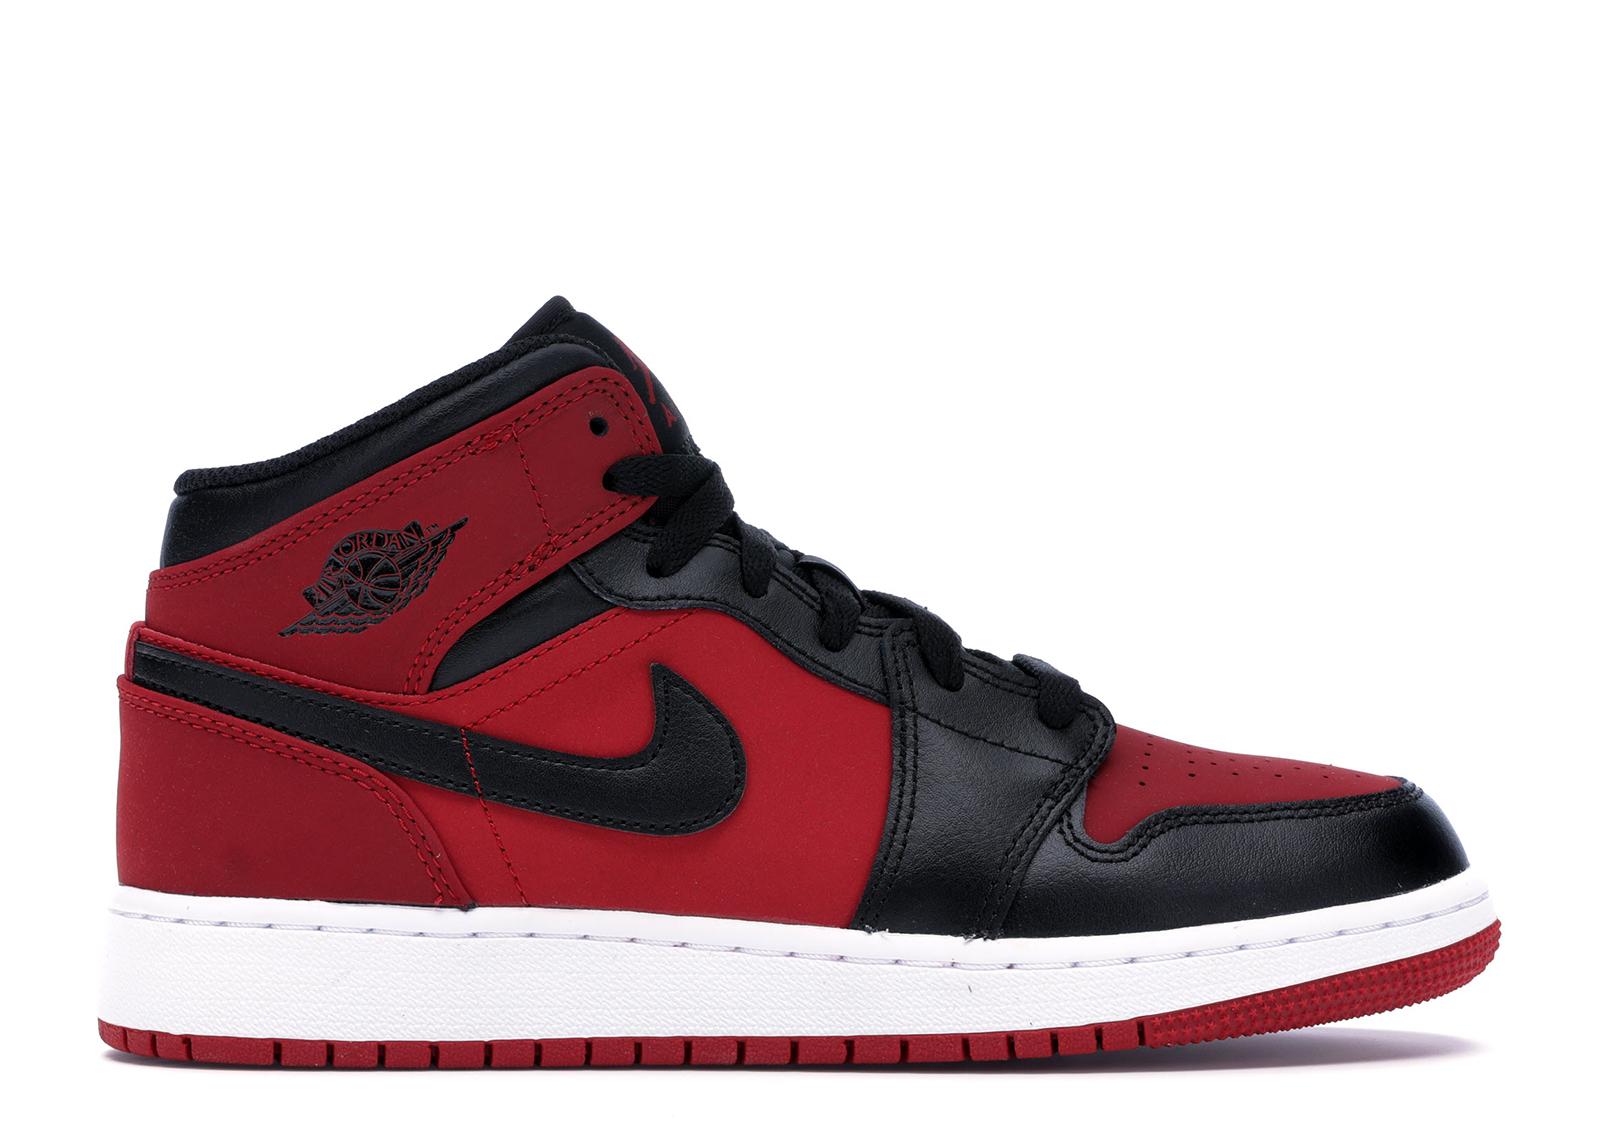 Jordan 1 Mid Gym Red Black (GS